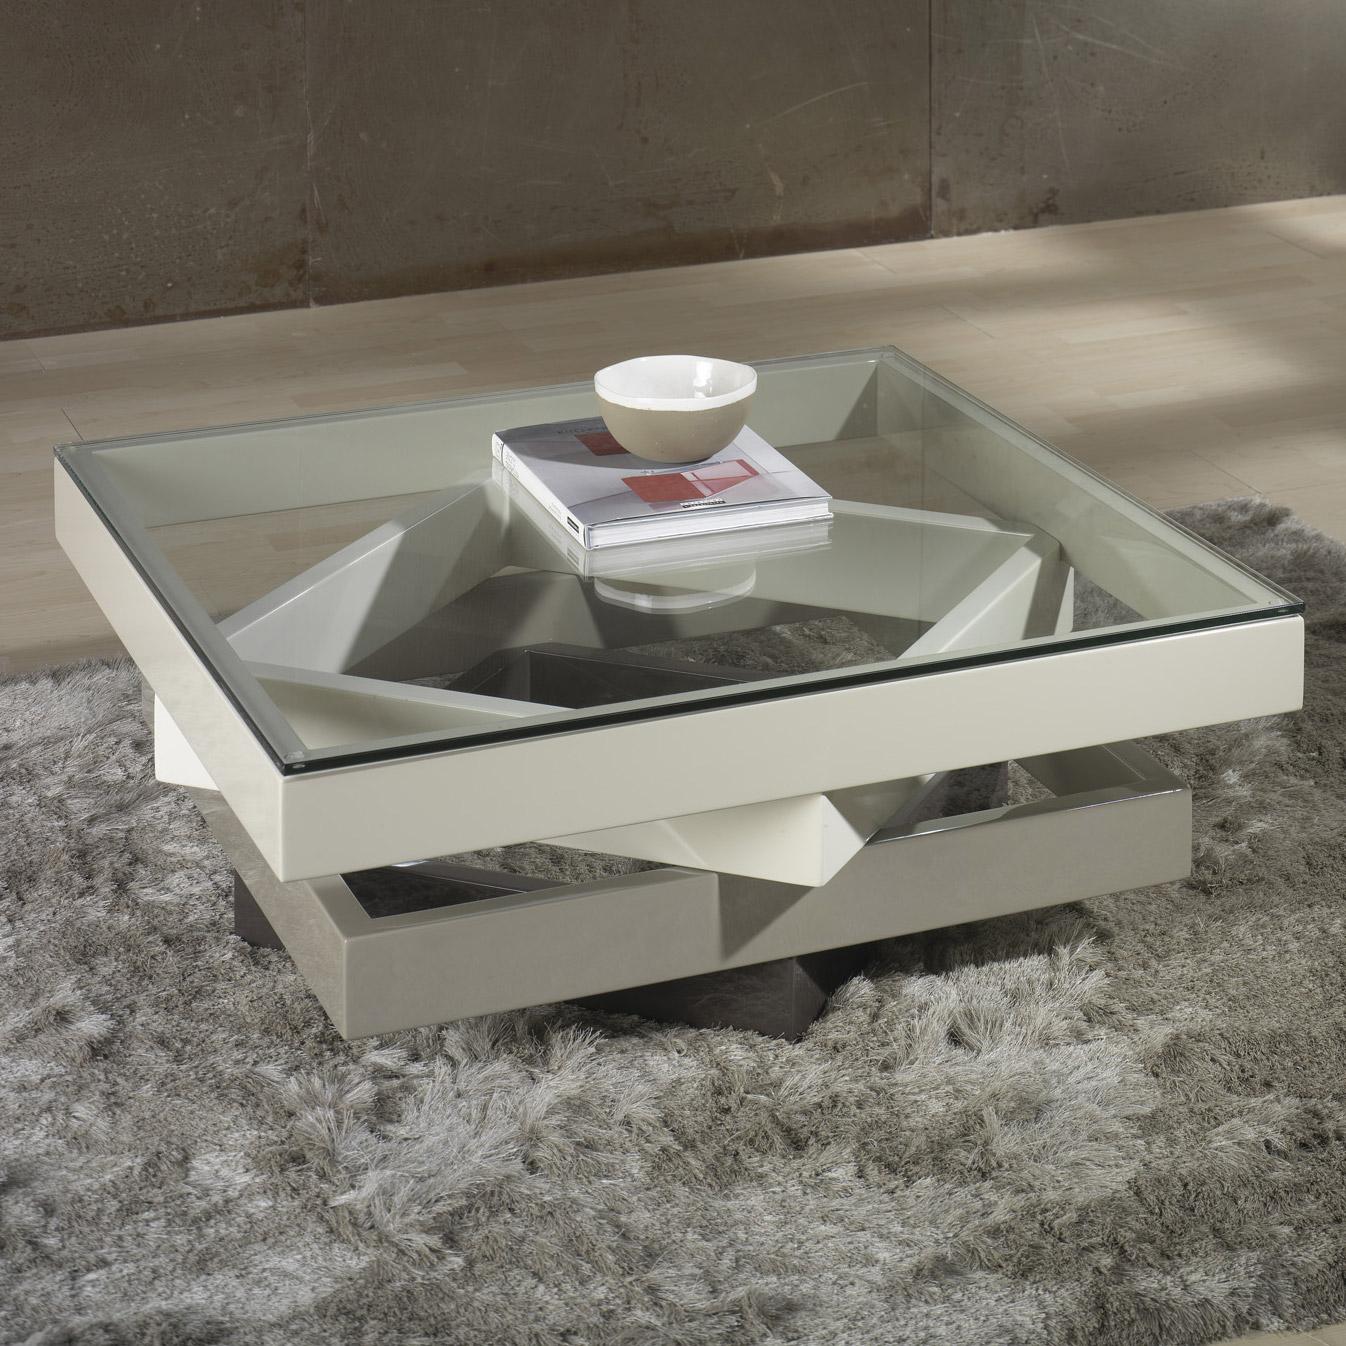 Table basse carr e bois et verre design en image for Table basse en verre et bois